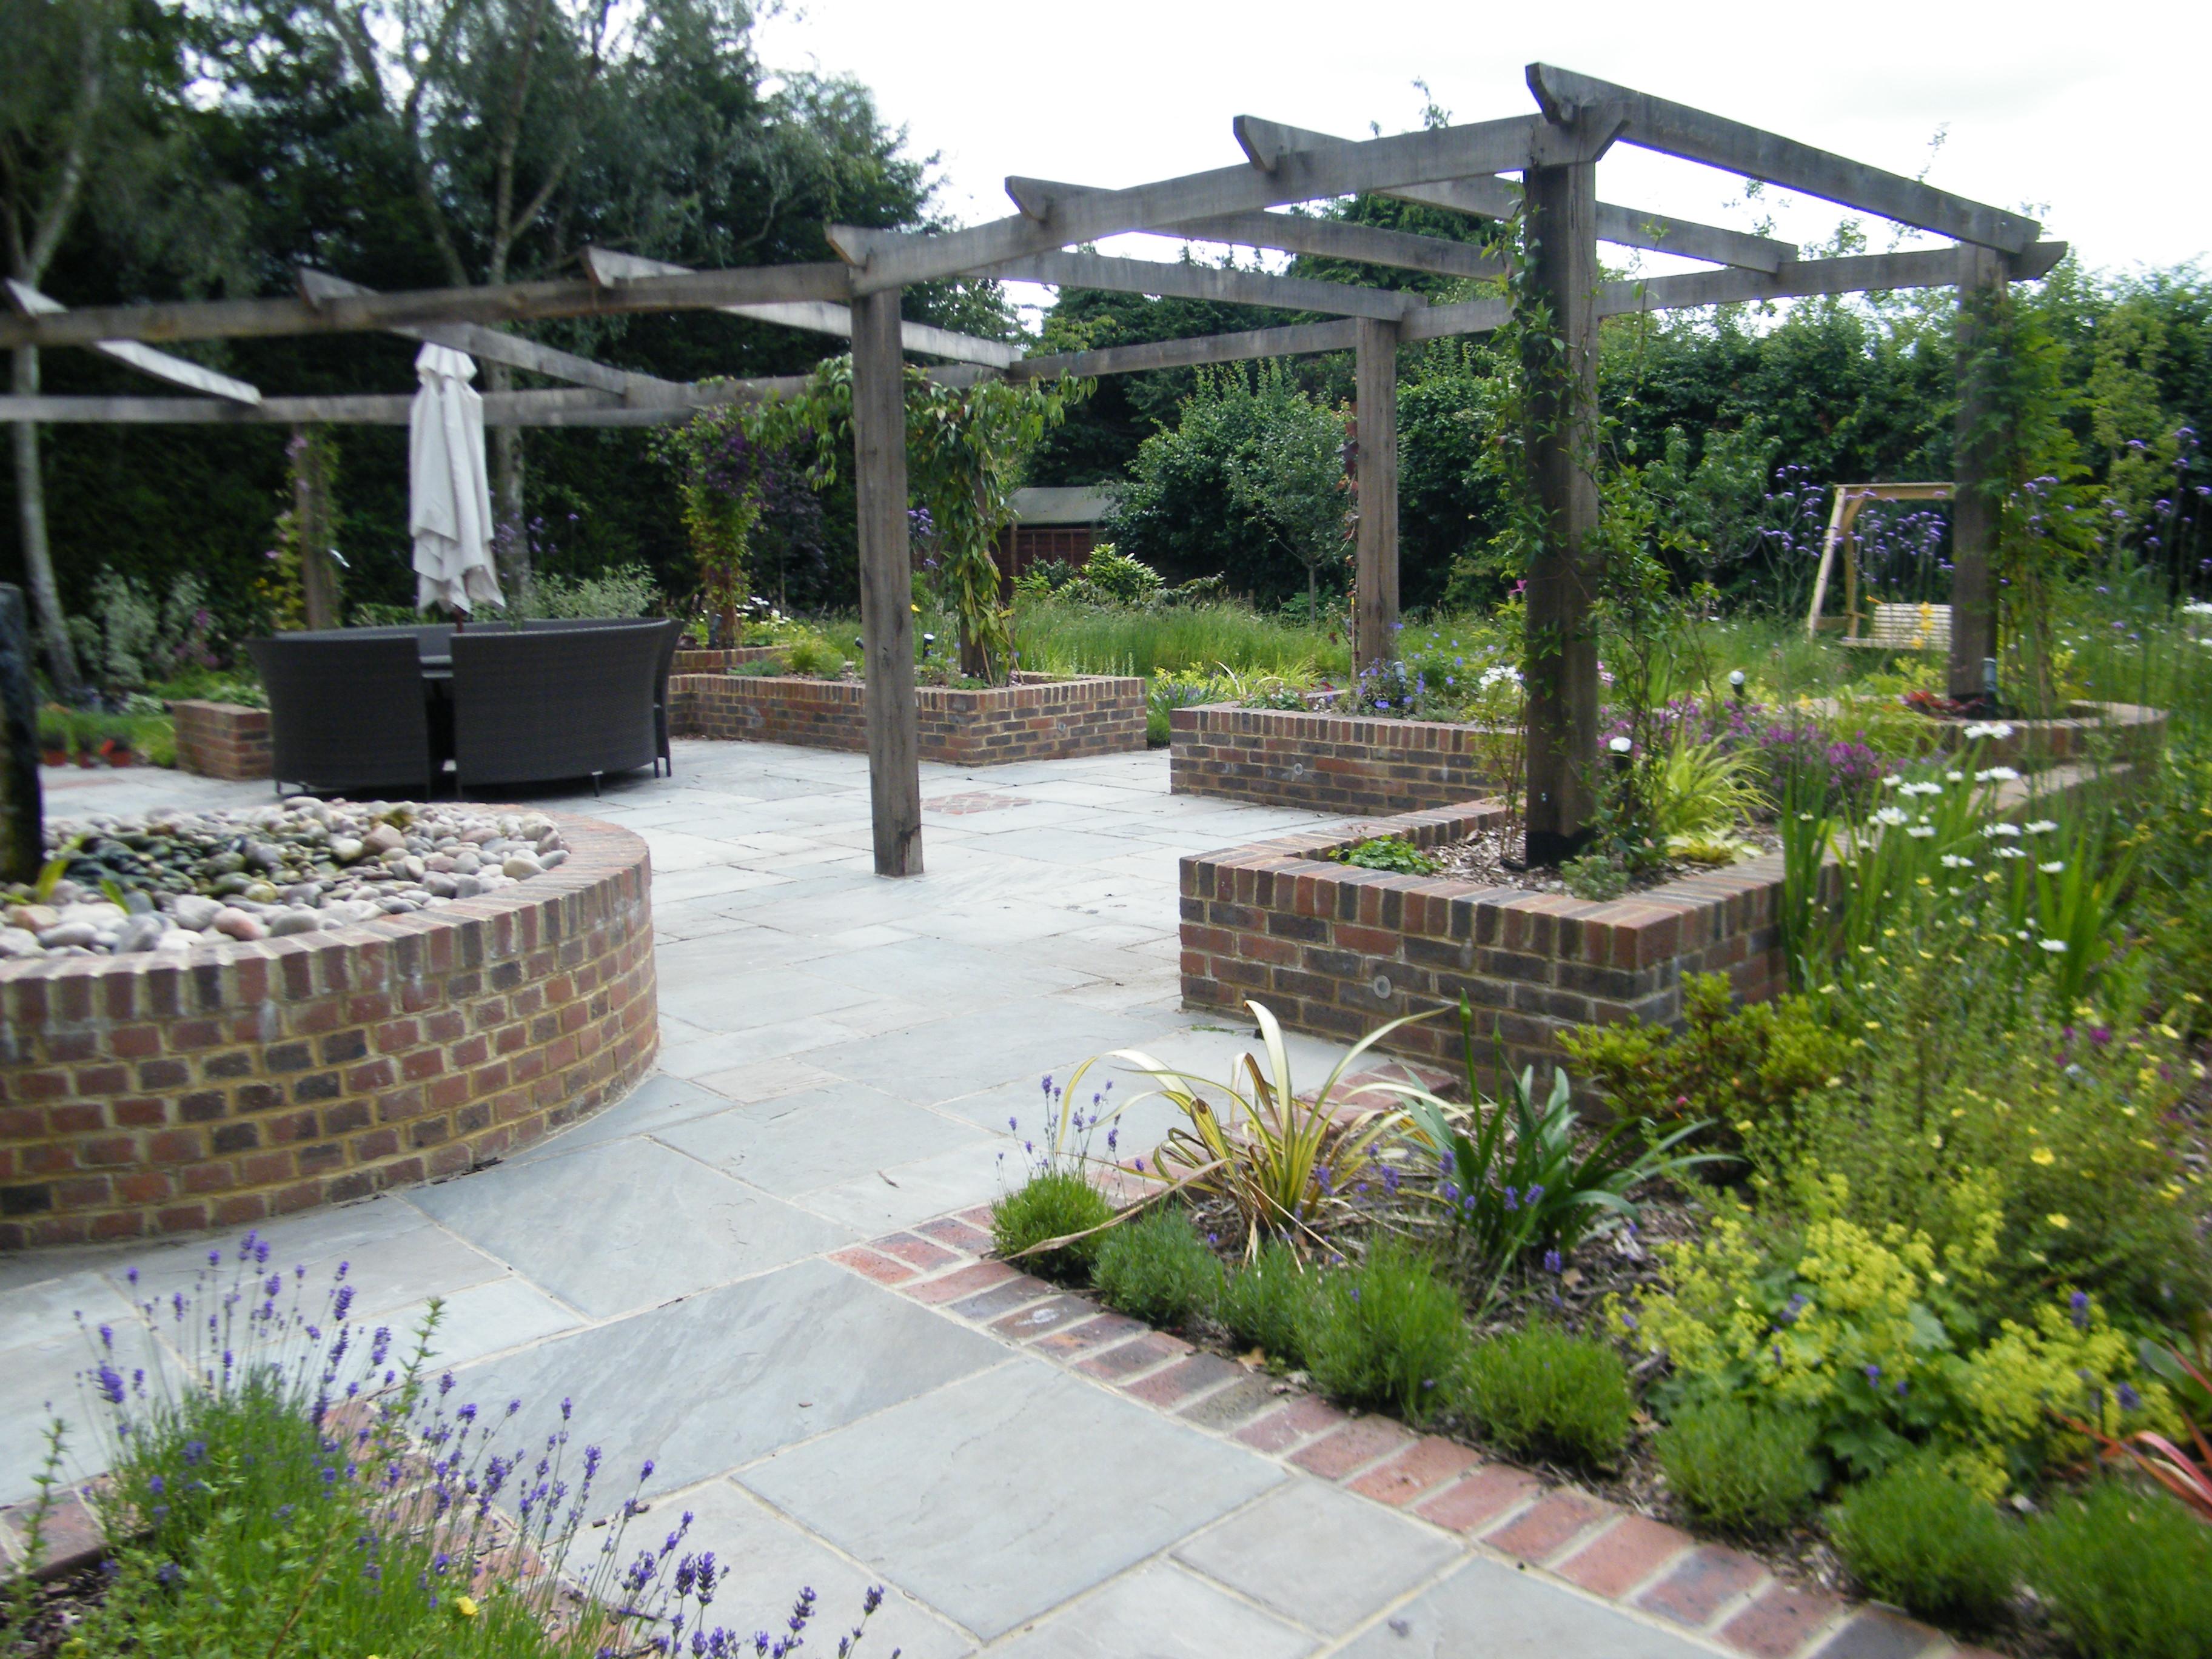 Minimalist Gardens Design | Floral & Hardy | London | UK on Patio And Grass Garden Ideas id=49309